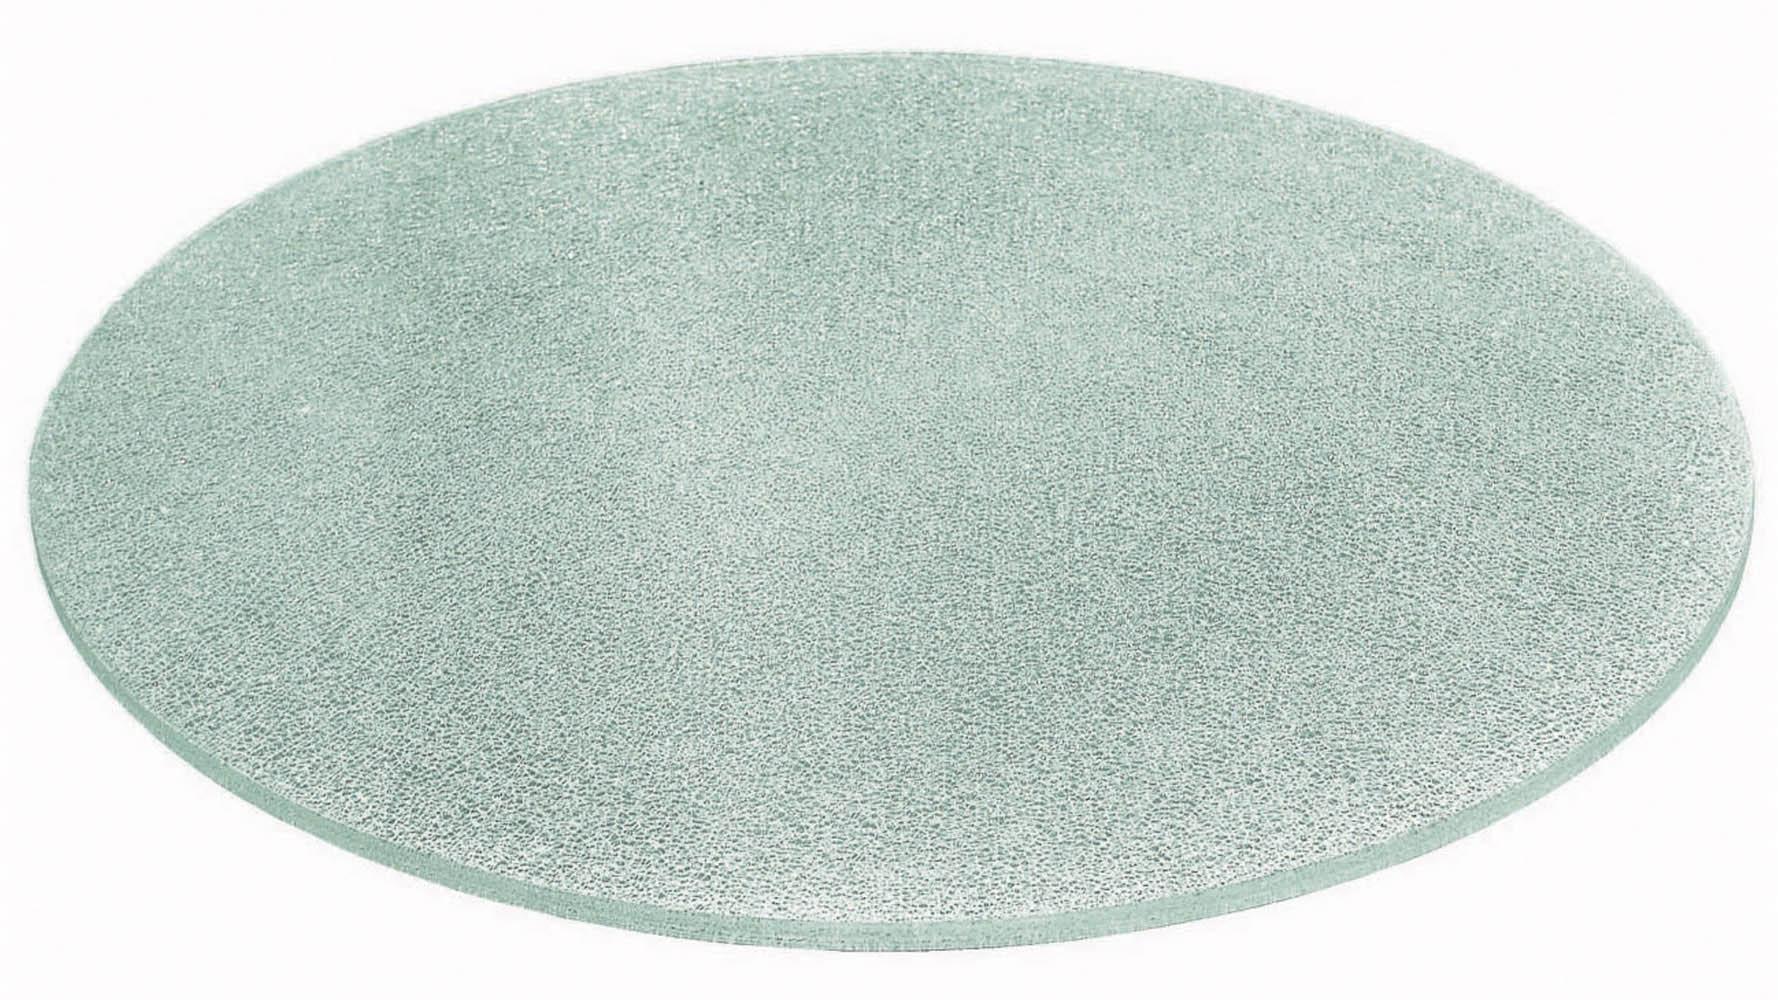 Jezek 60 Inch Dining Table